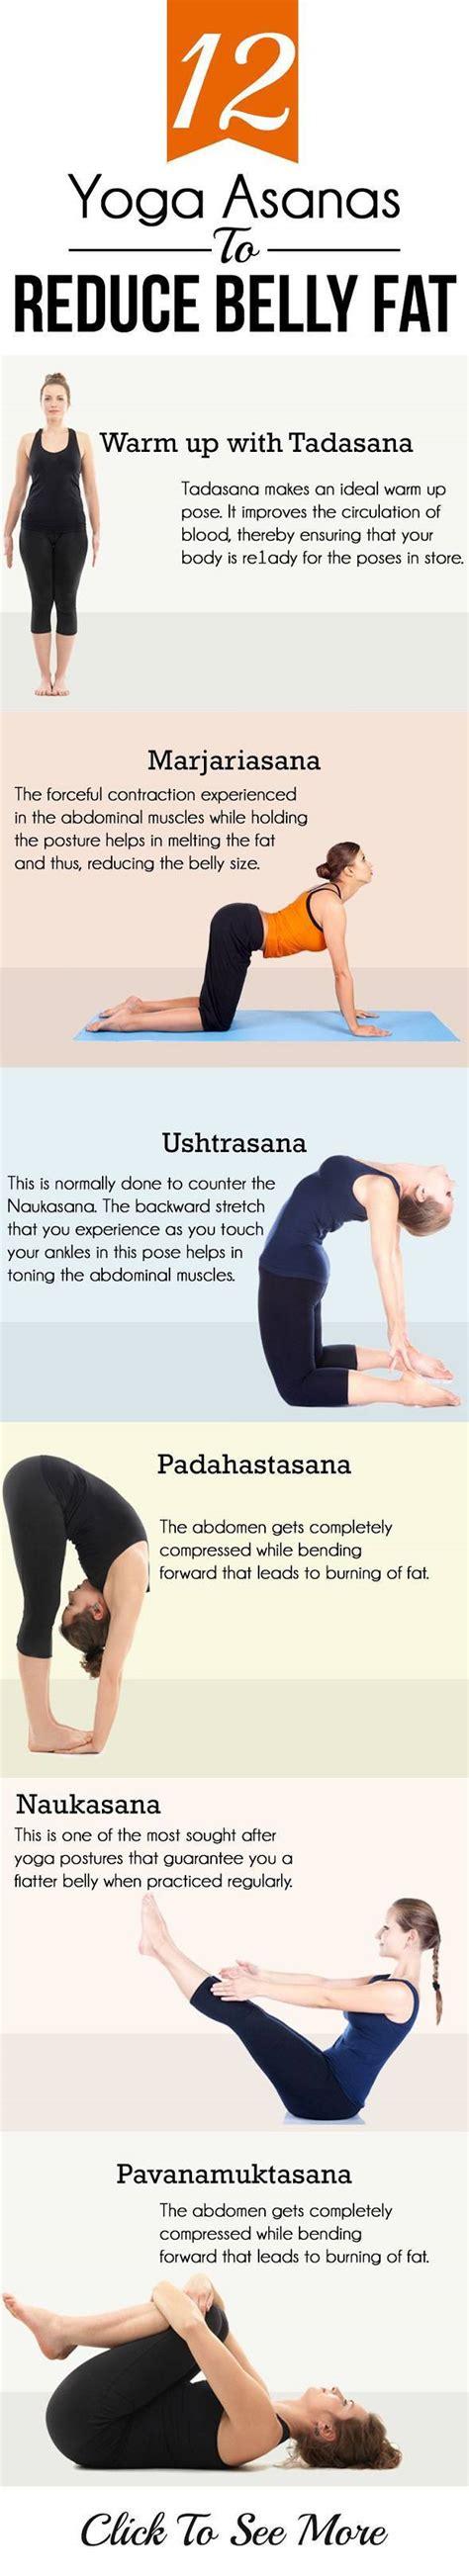 The Best Fat Burning Yoga Workouts & Exercises